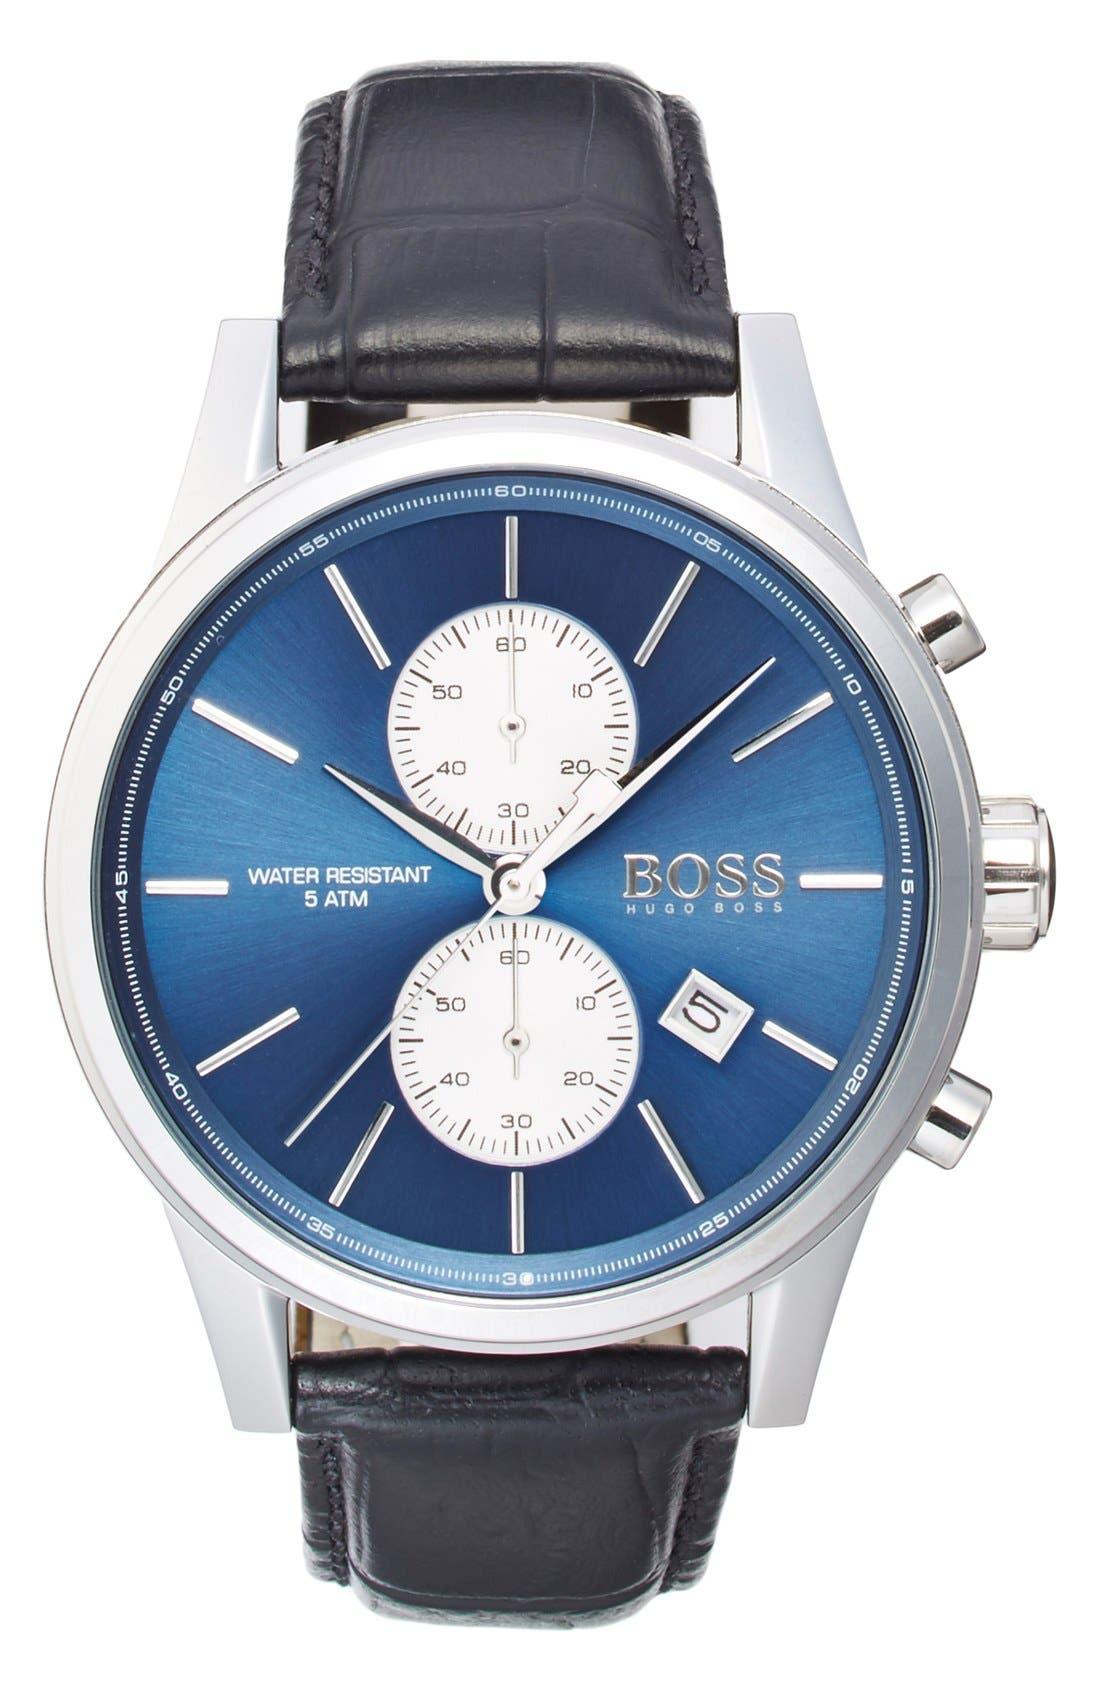 Main Image - BOSS 'Jet Sport' Chronograph Leather Strap Watch, 41mm